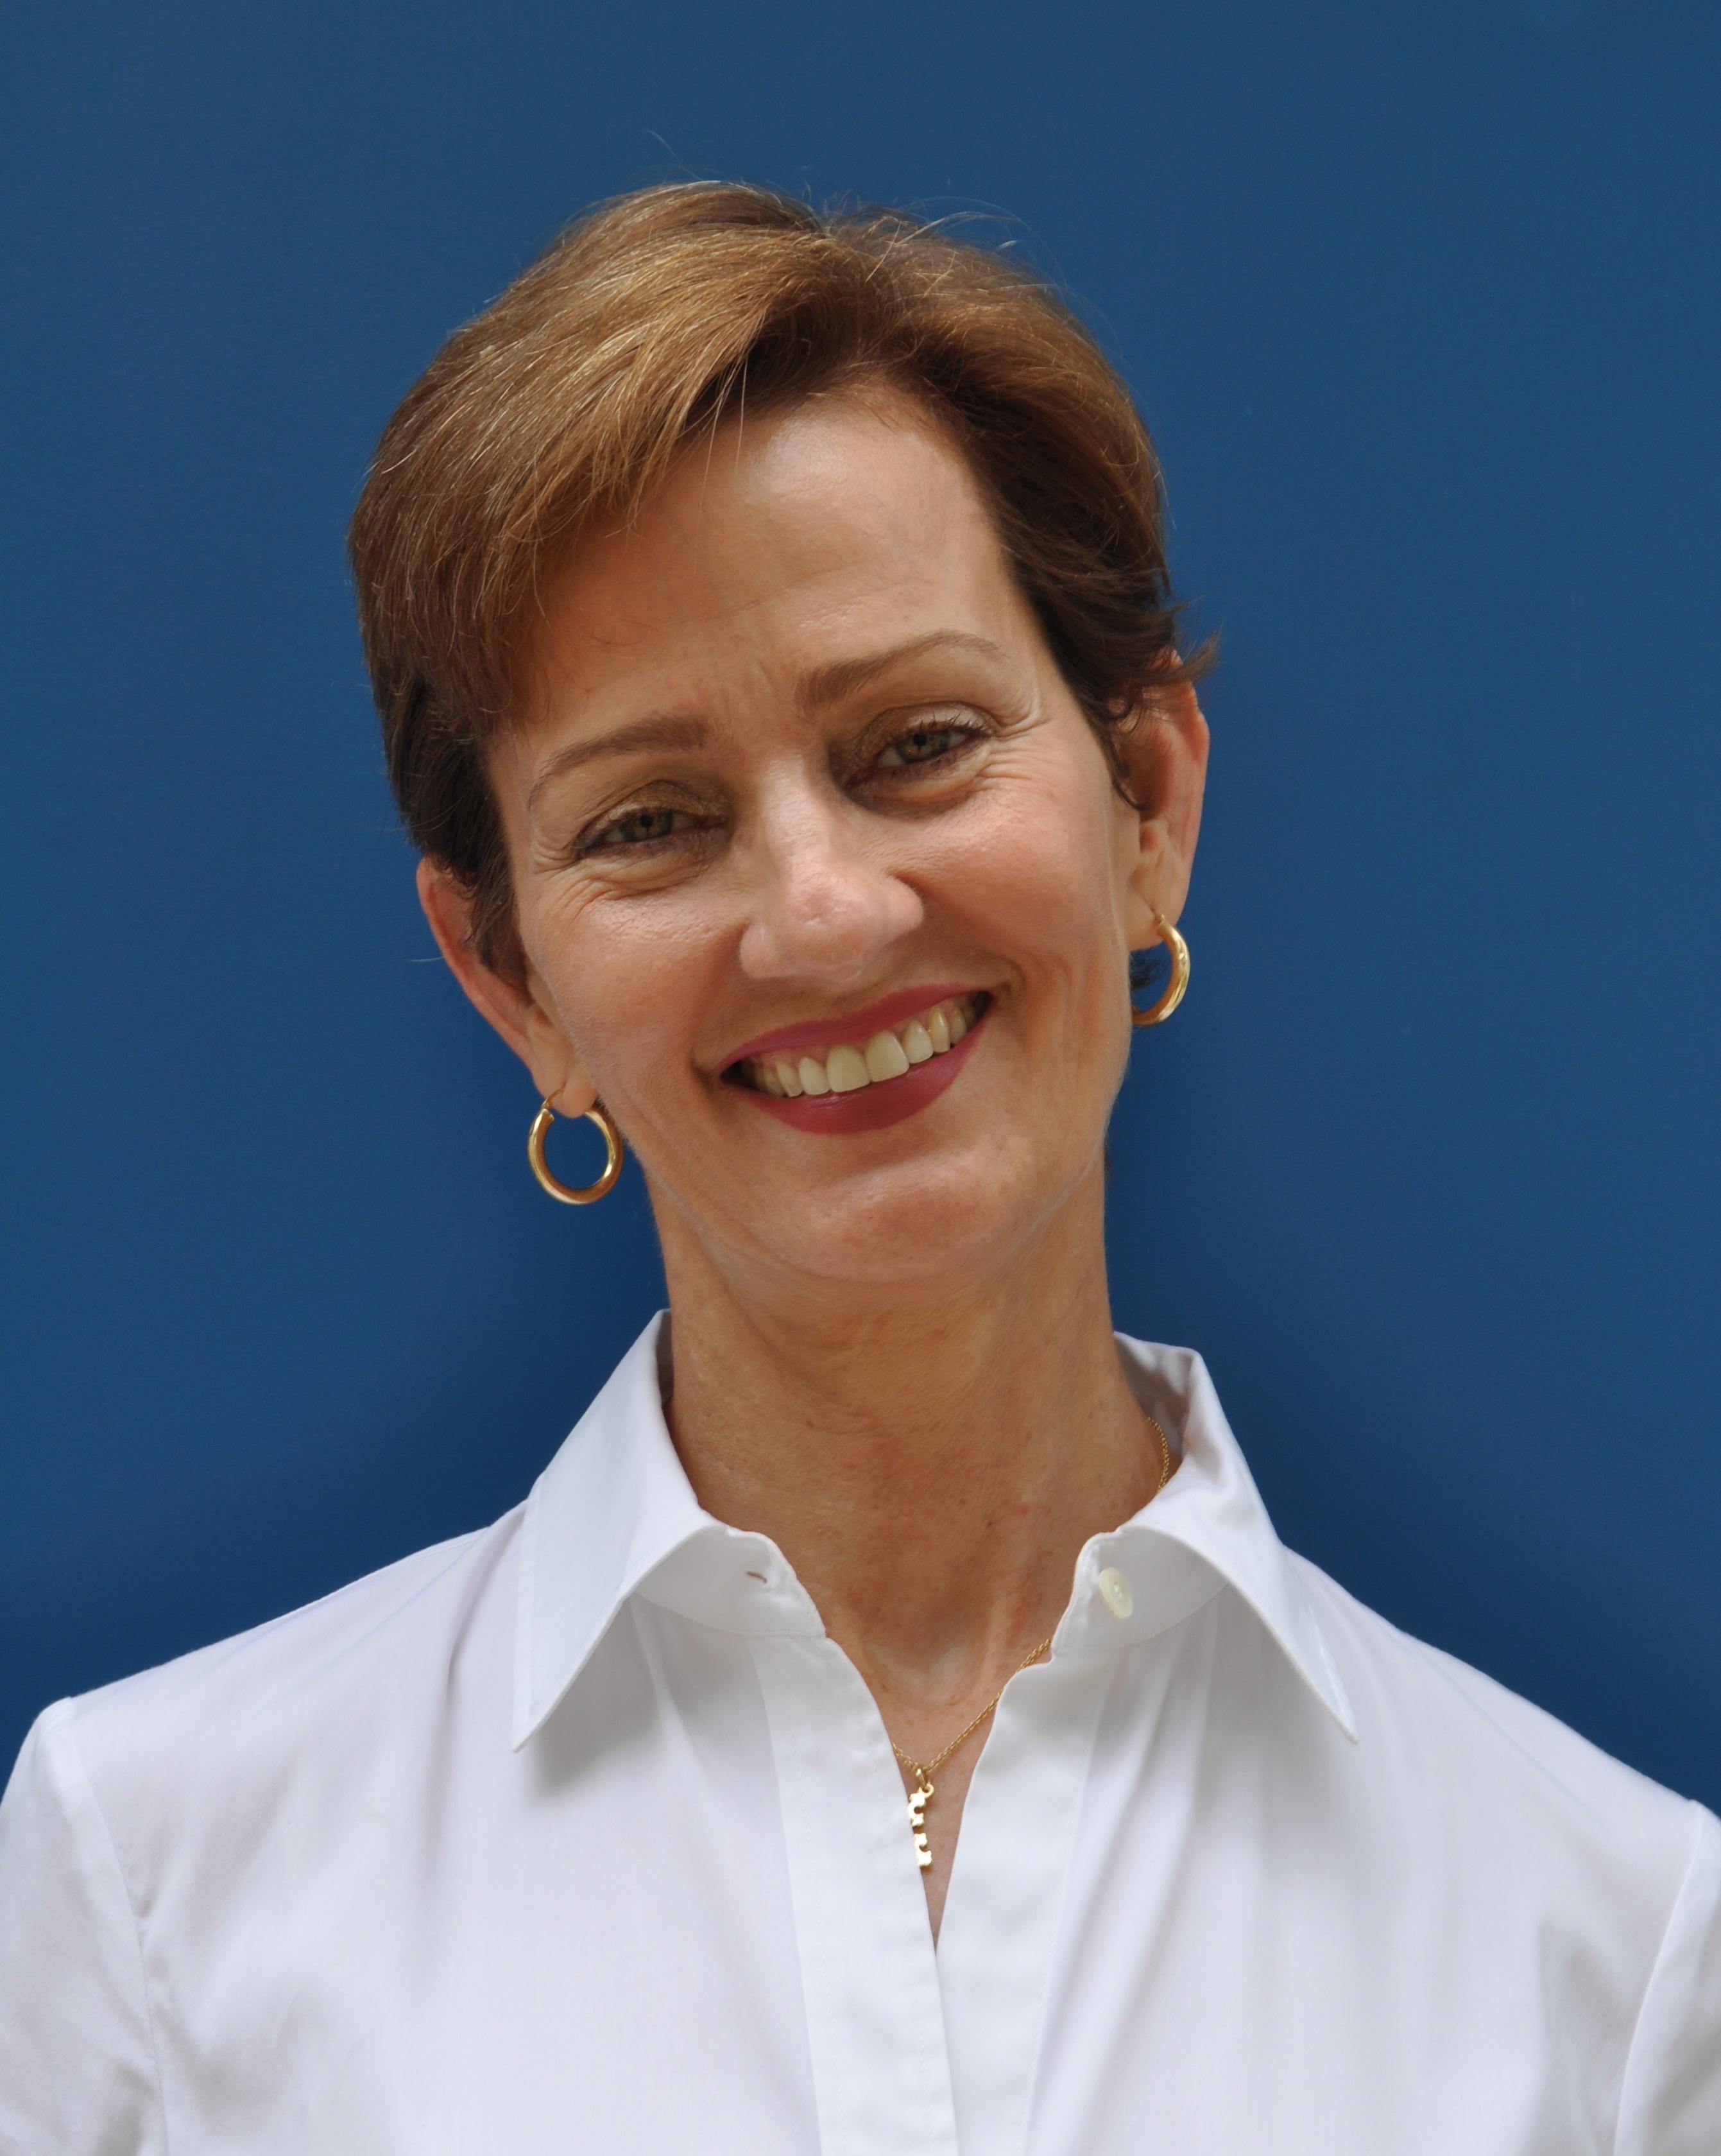 Meg Daly